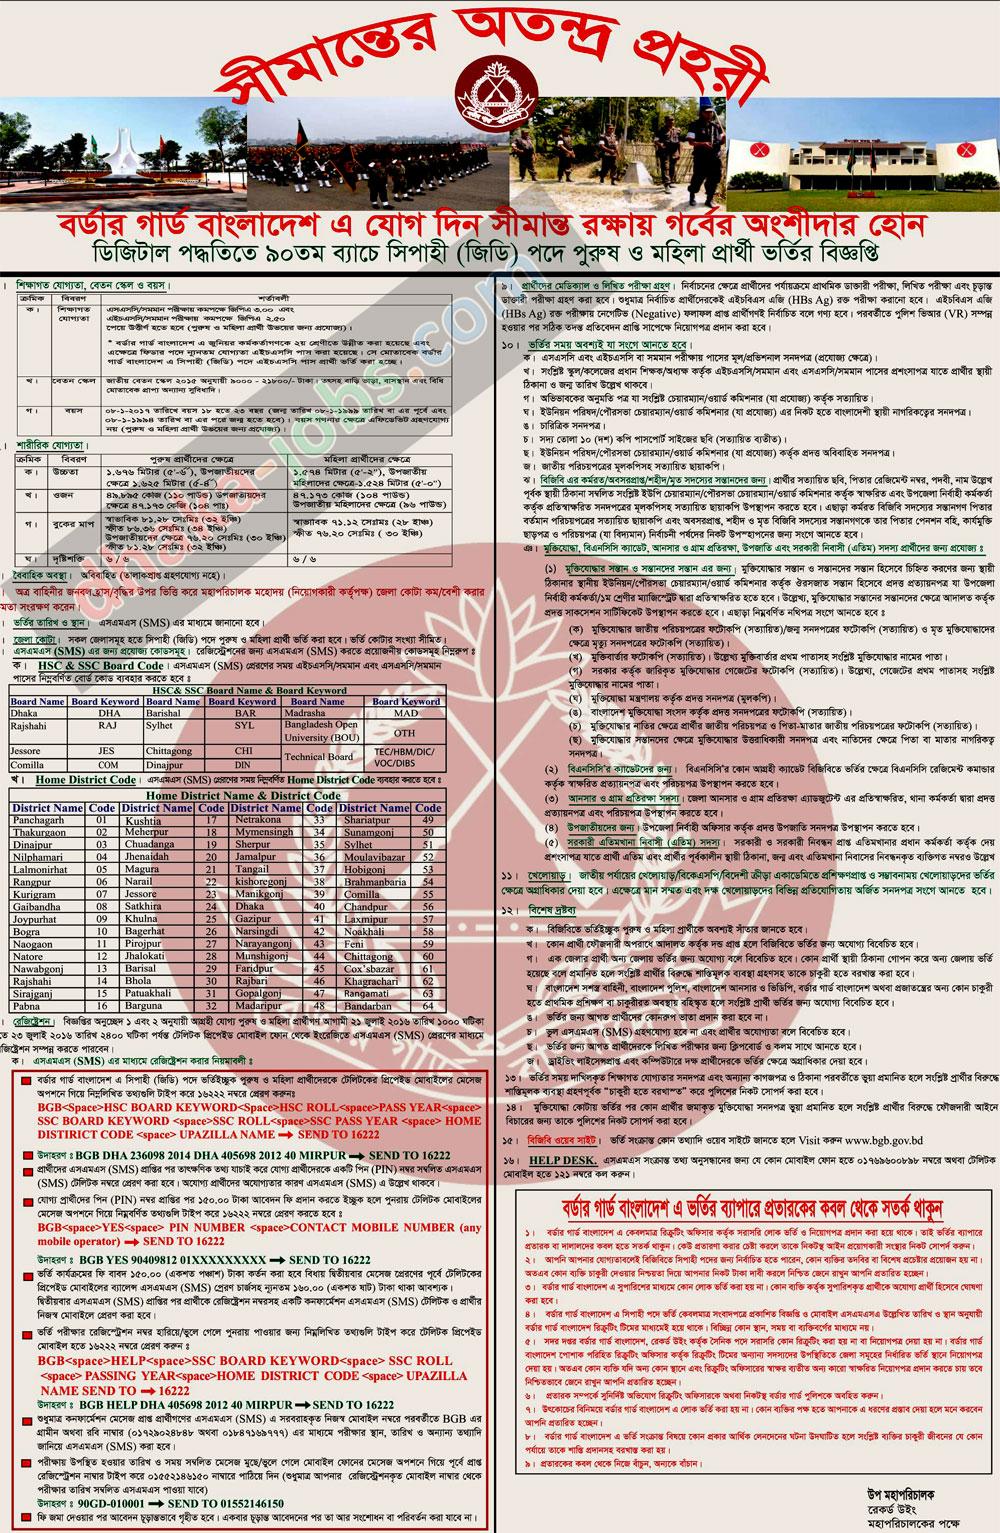 Border Guard Bangladesh Job Circular 2016